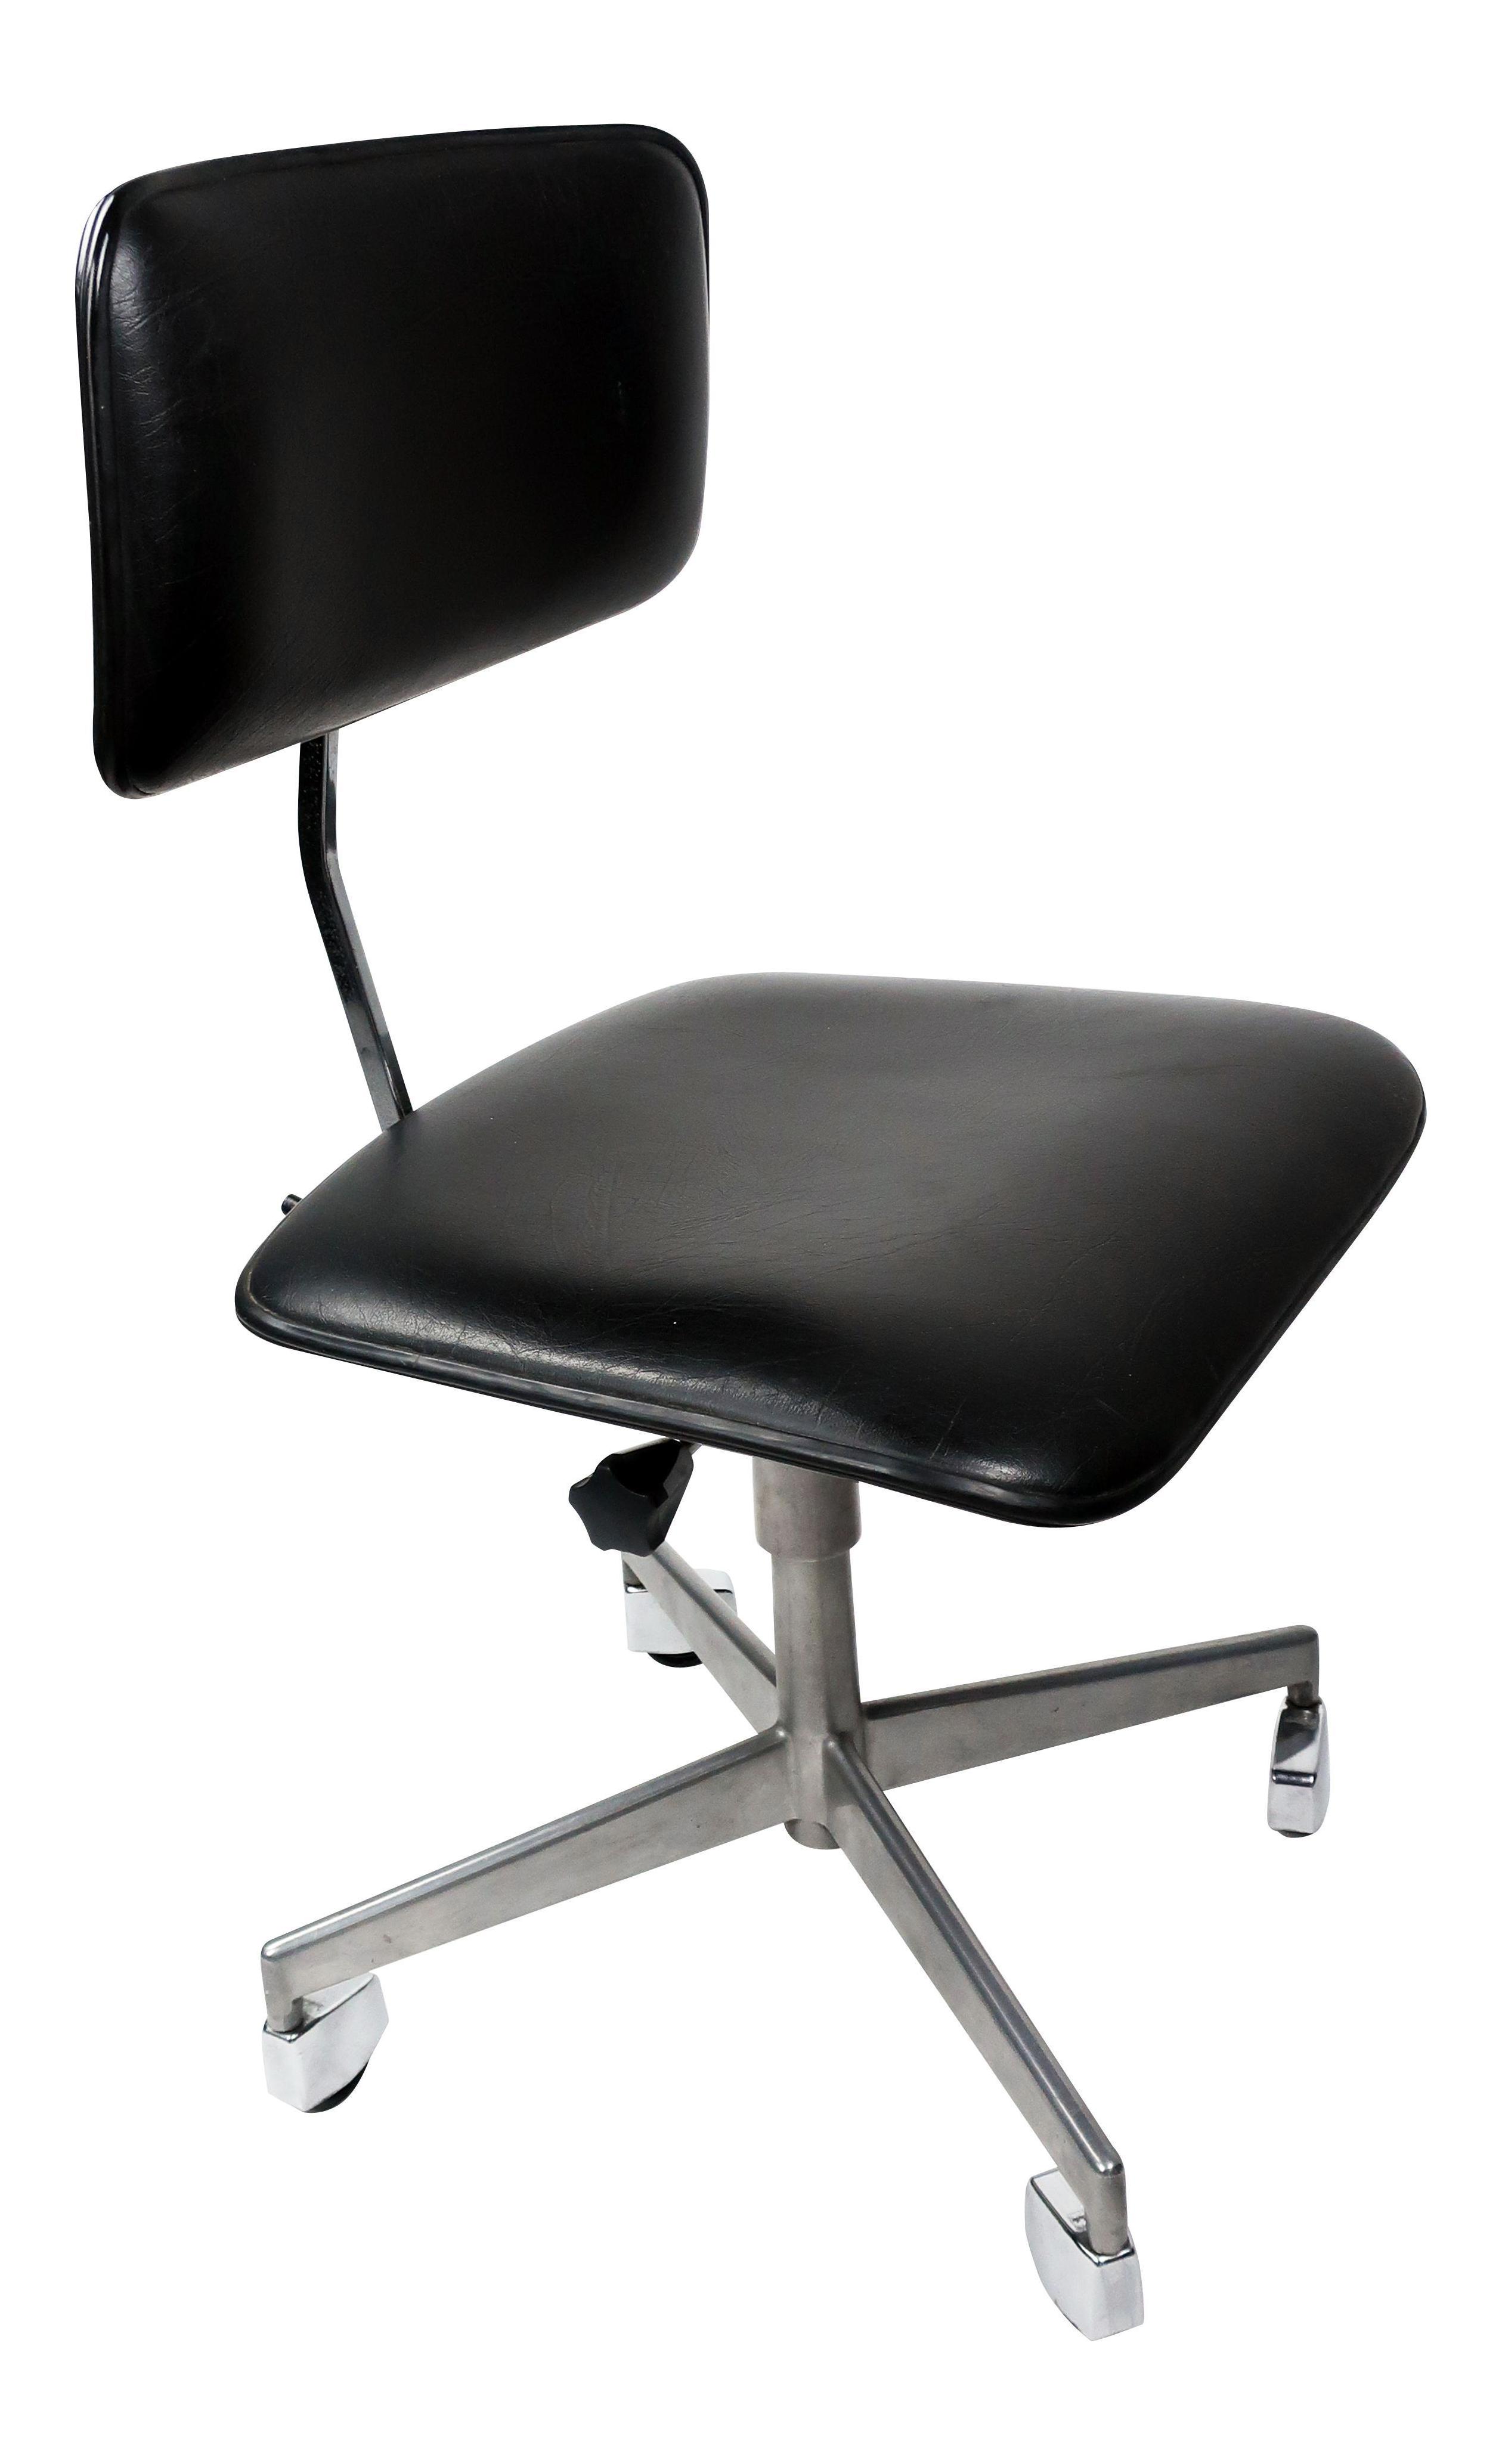 vintage labofa danish modern office chair